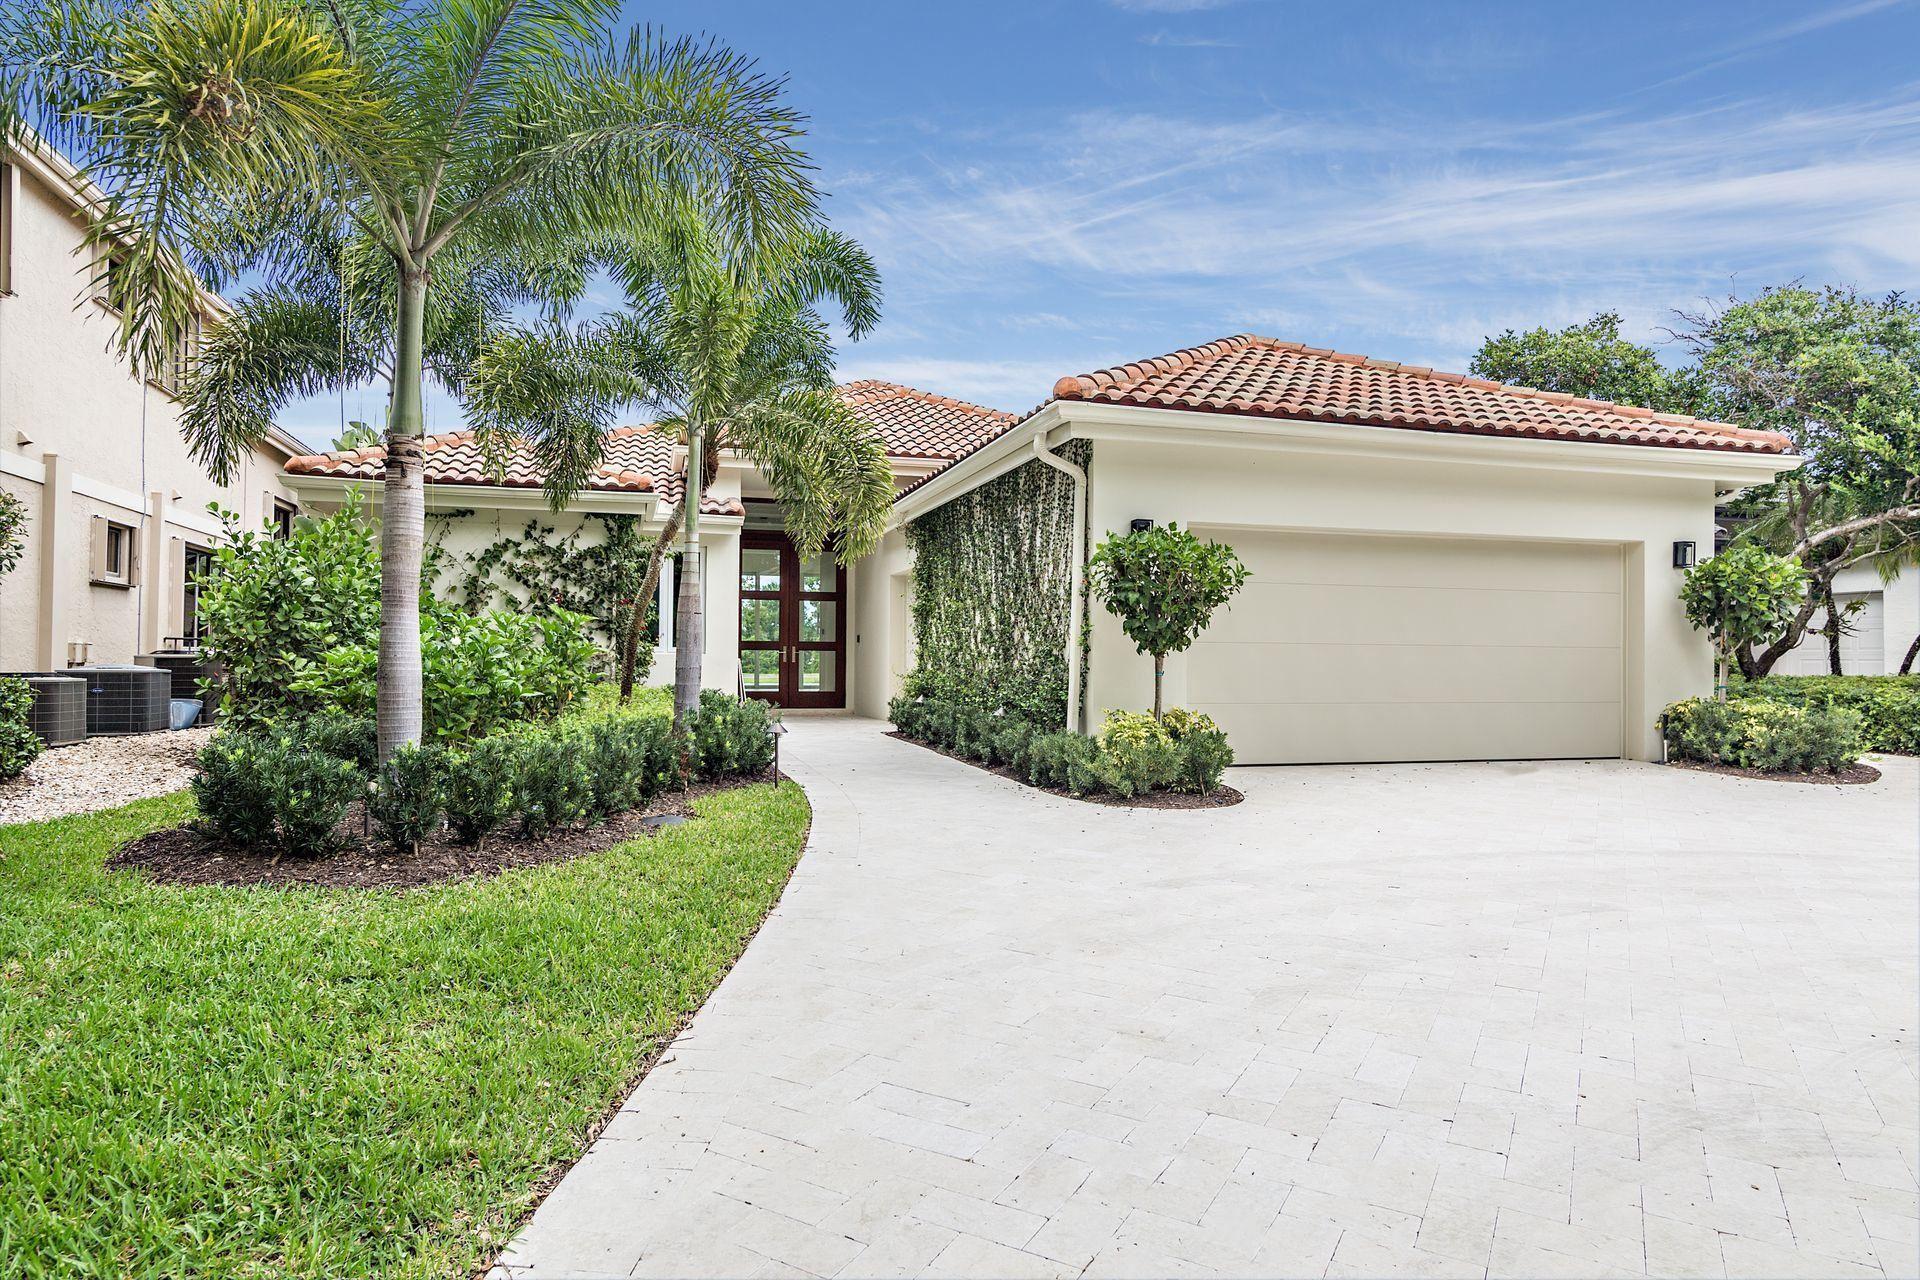 Photo of 3827 Toulouse Drive, Palm Beach Gardens, FL 33410 (MLS # RX-10517983)